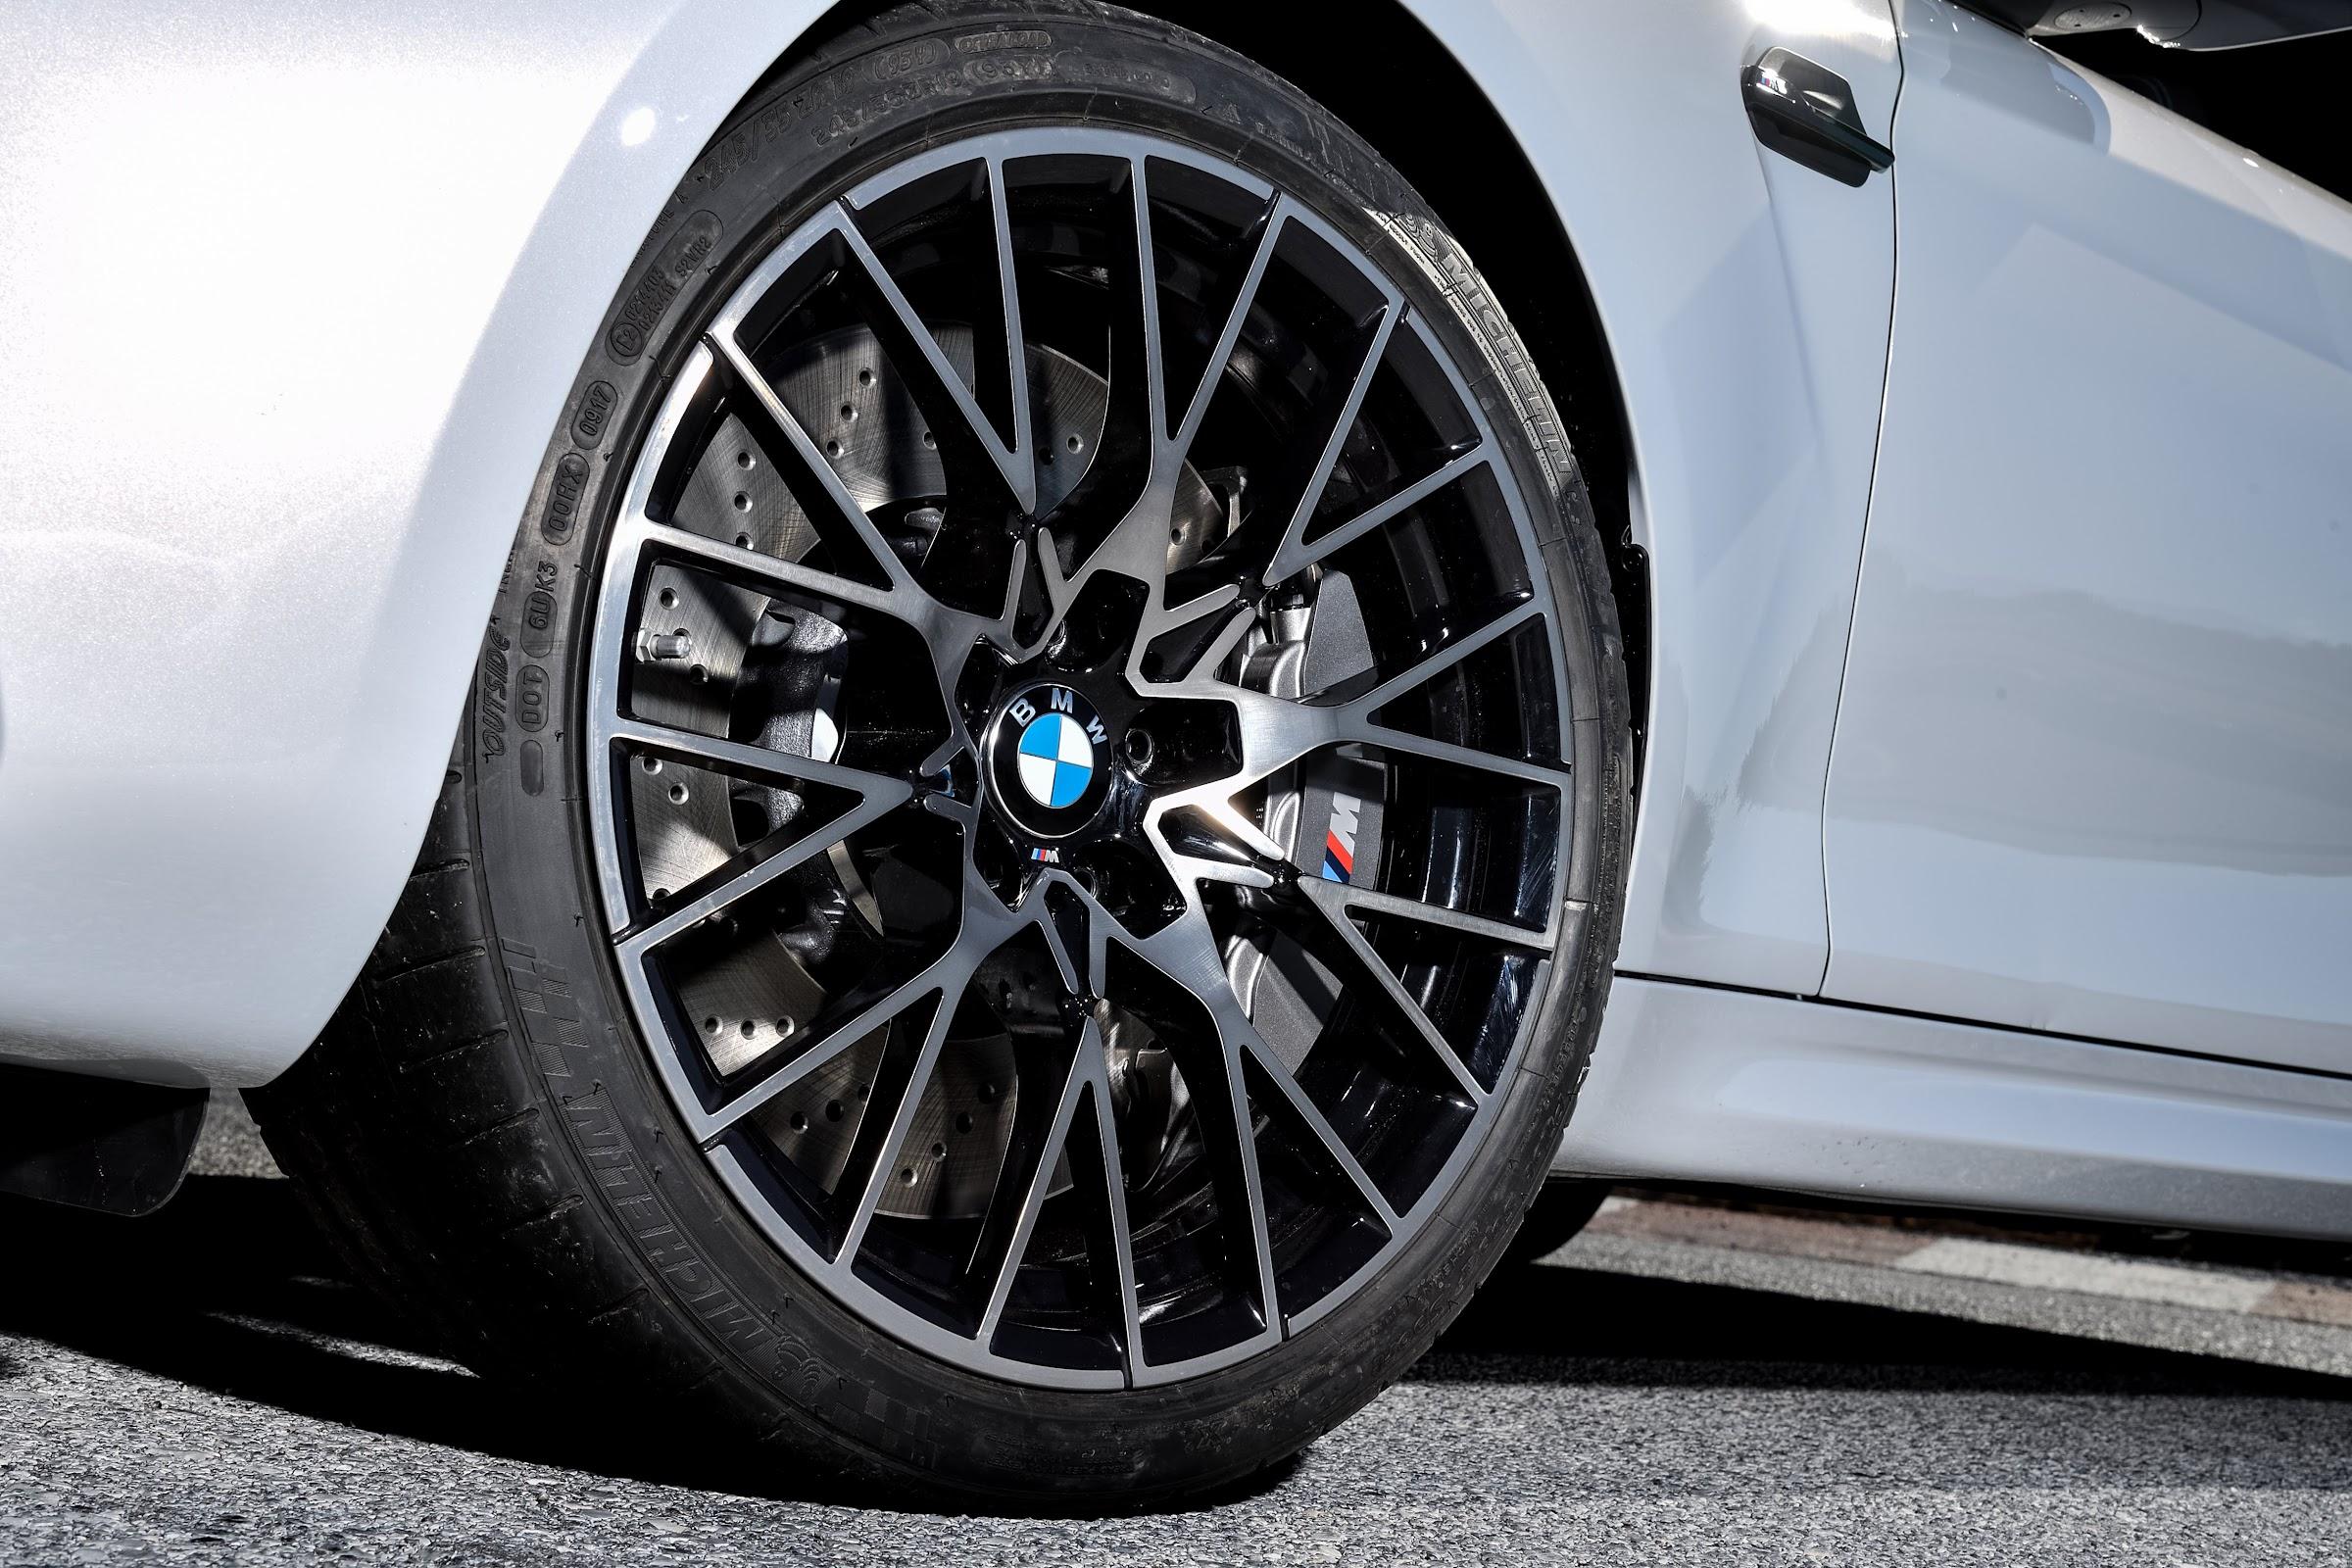 AH5uoRGAdasyPeFO9j4dpwYRX1SKweUCNB28HFMxkIUevb7OIKNA6TzDyvtrz6Rh4zjj0E9pYH6xGp5YHZZiNoOLyywmgArLlgmPAexGCbU7XGjD4MbB1NuTdYucwTsvVXR1Tc FRg=w2400 - Galería fotográfica: BMW M2 Competition